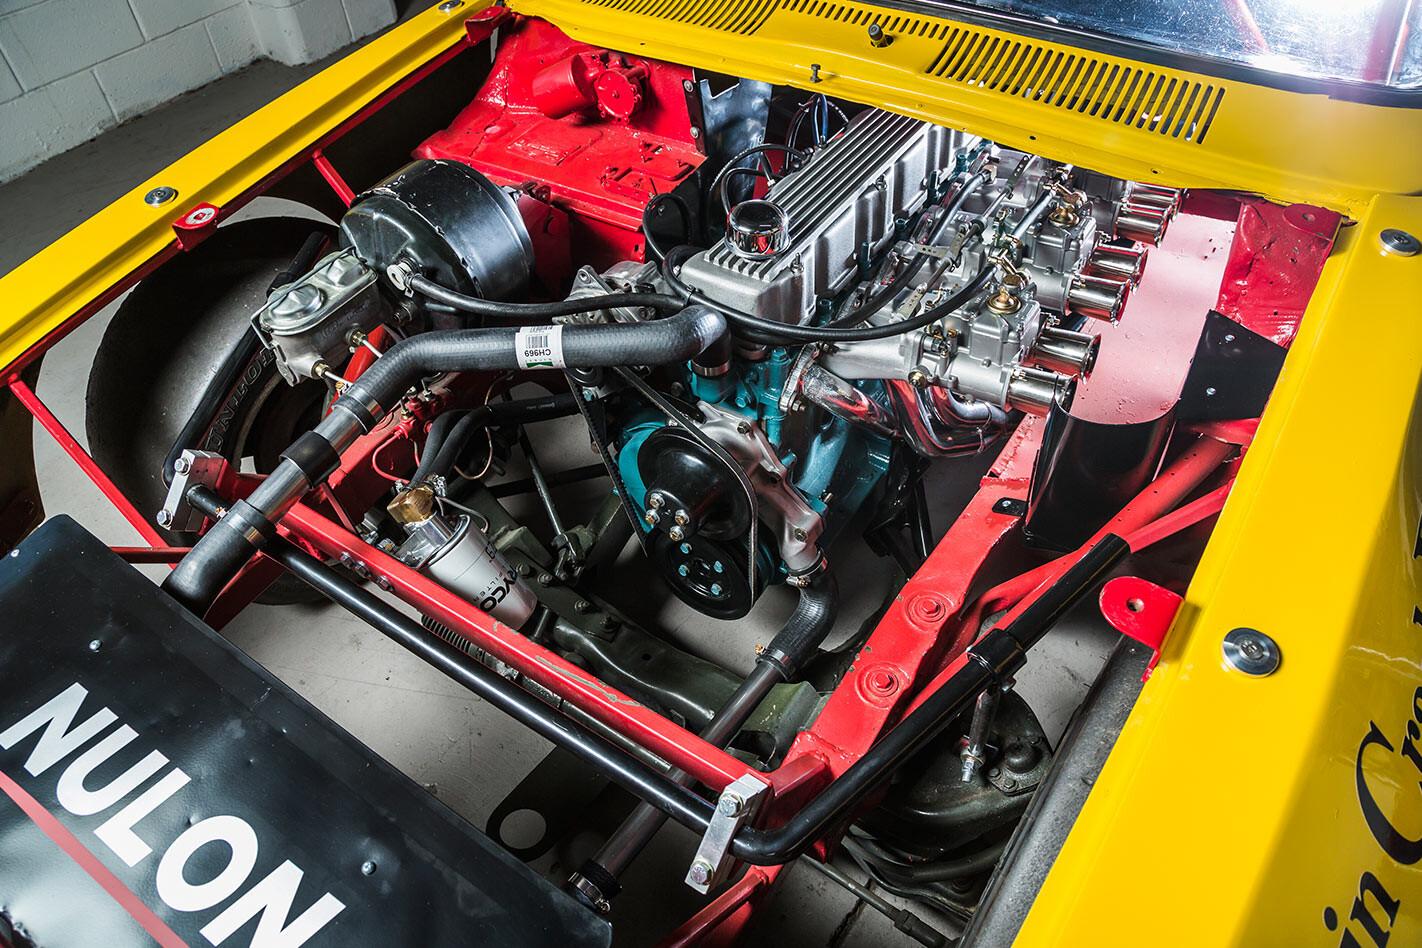 Holden LJ torana sports sedan engine bay